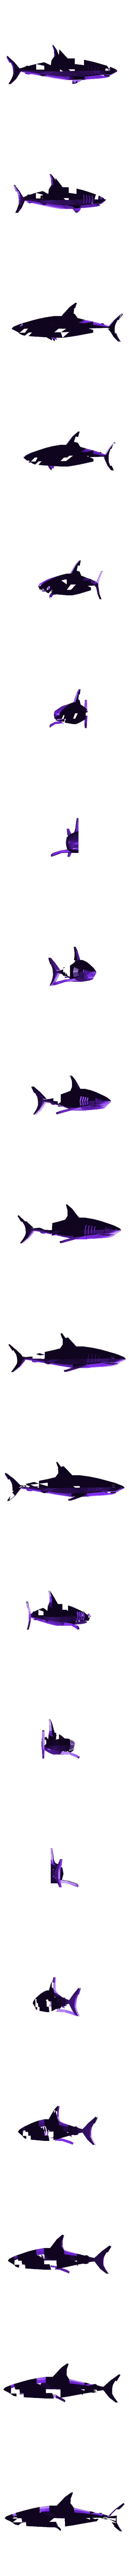 Shark.stl Download free STL file Marine Life Wall Project • 3D printer template, Double_Alfa_3D